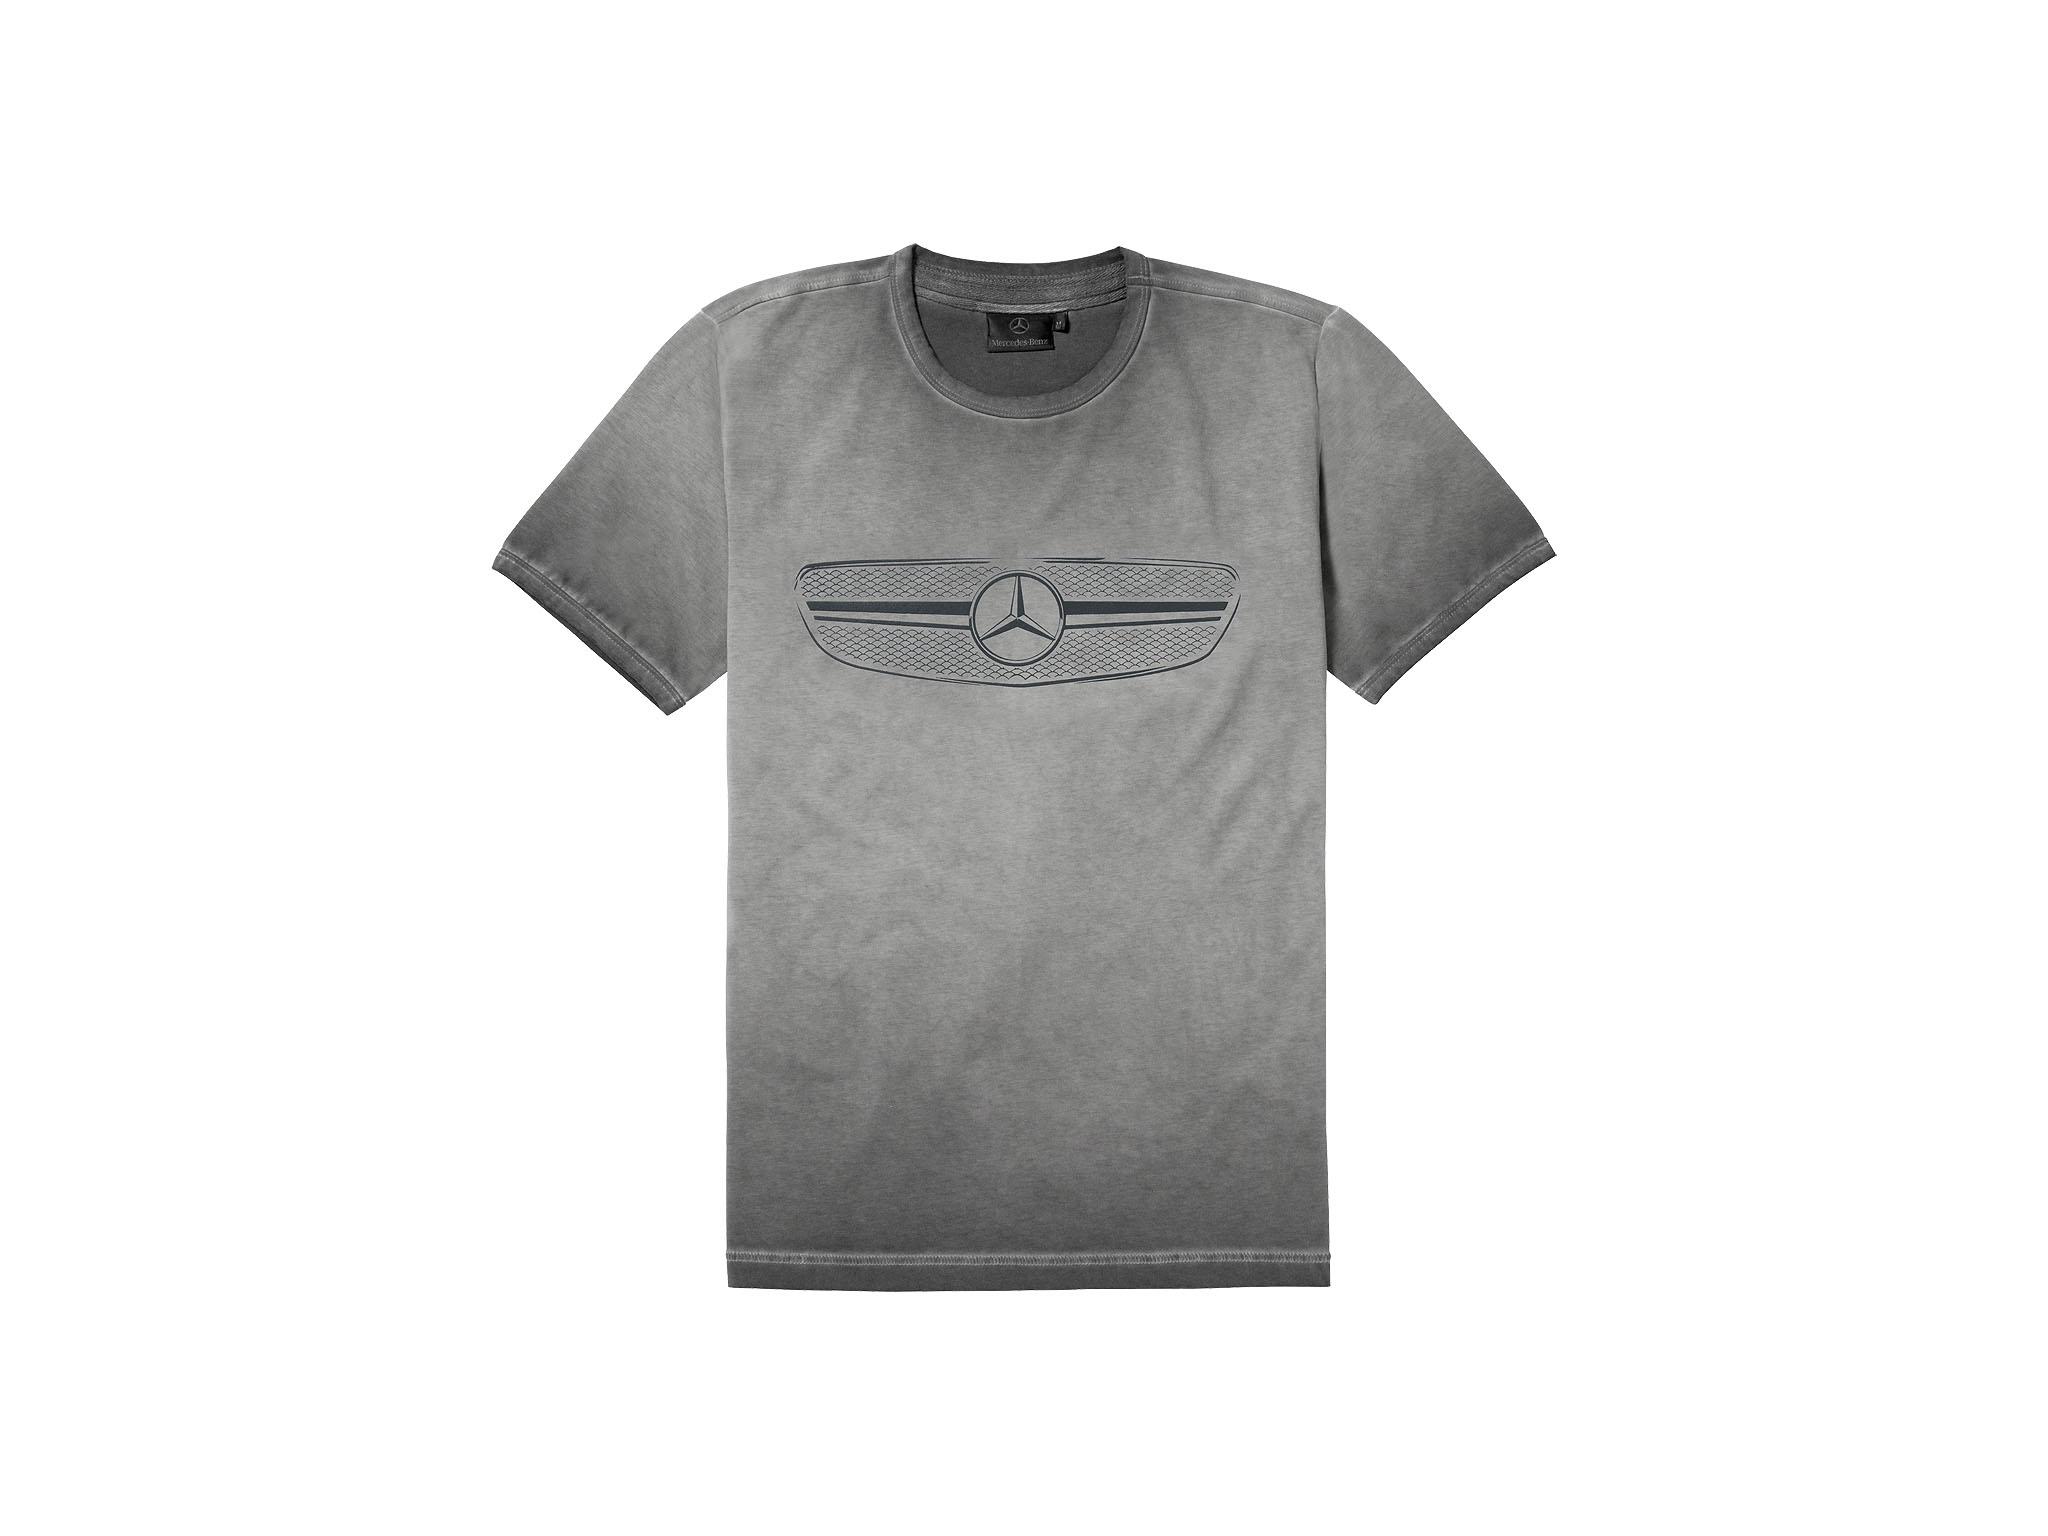 t shirt grey washing heren mercedes benz official. Black Bedroom Furniture Sets. Home Design Ideas